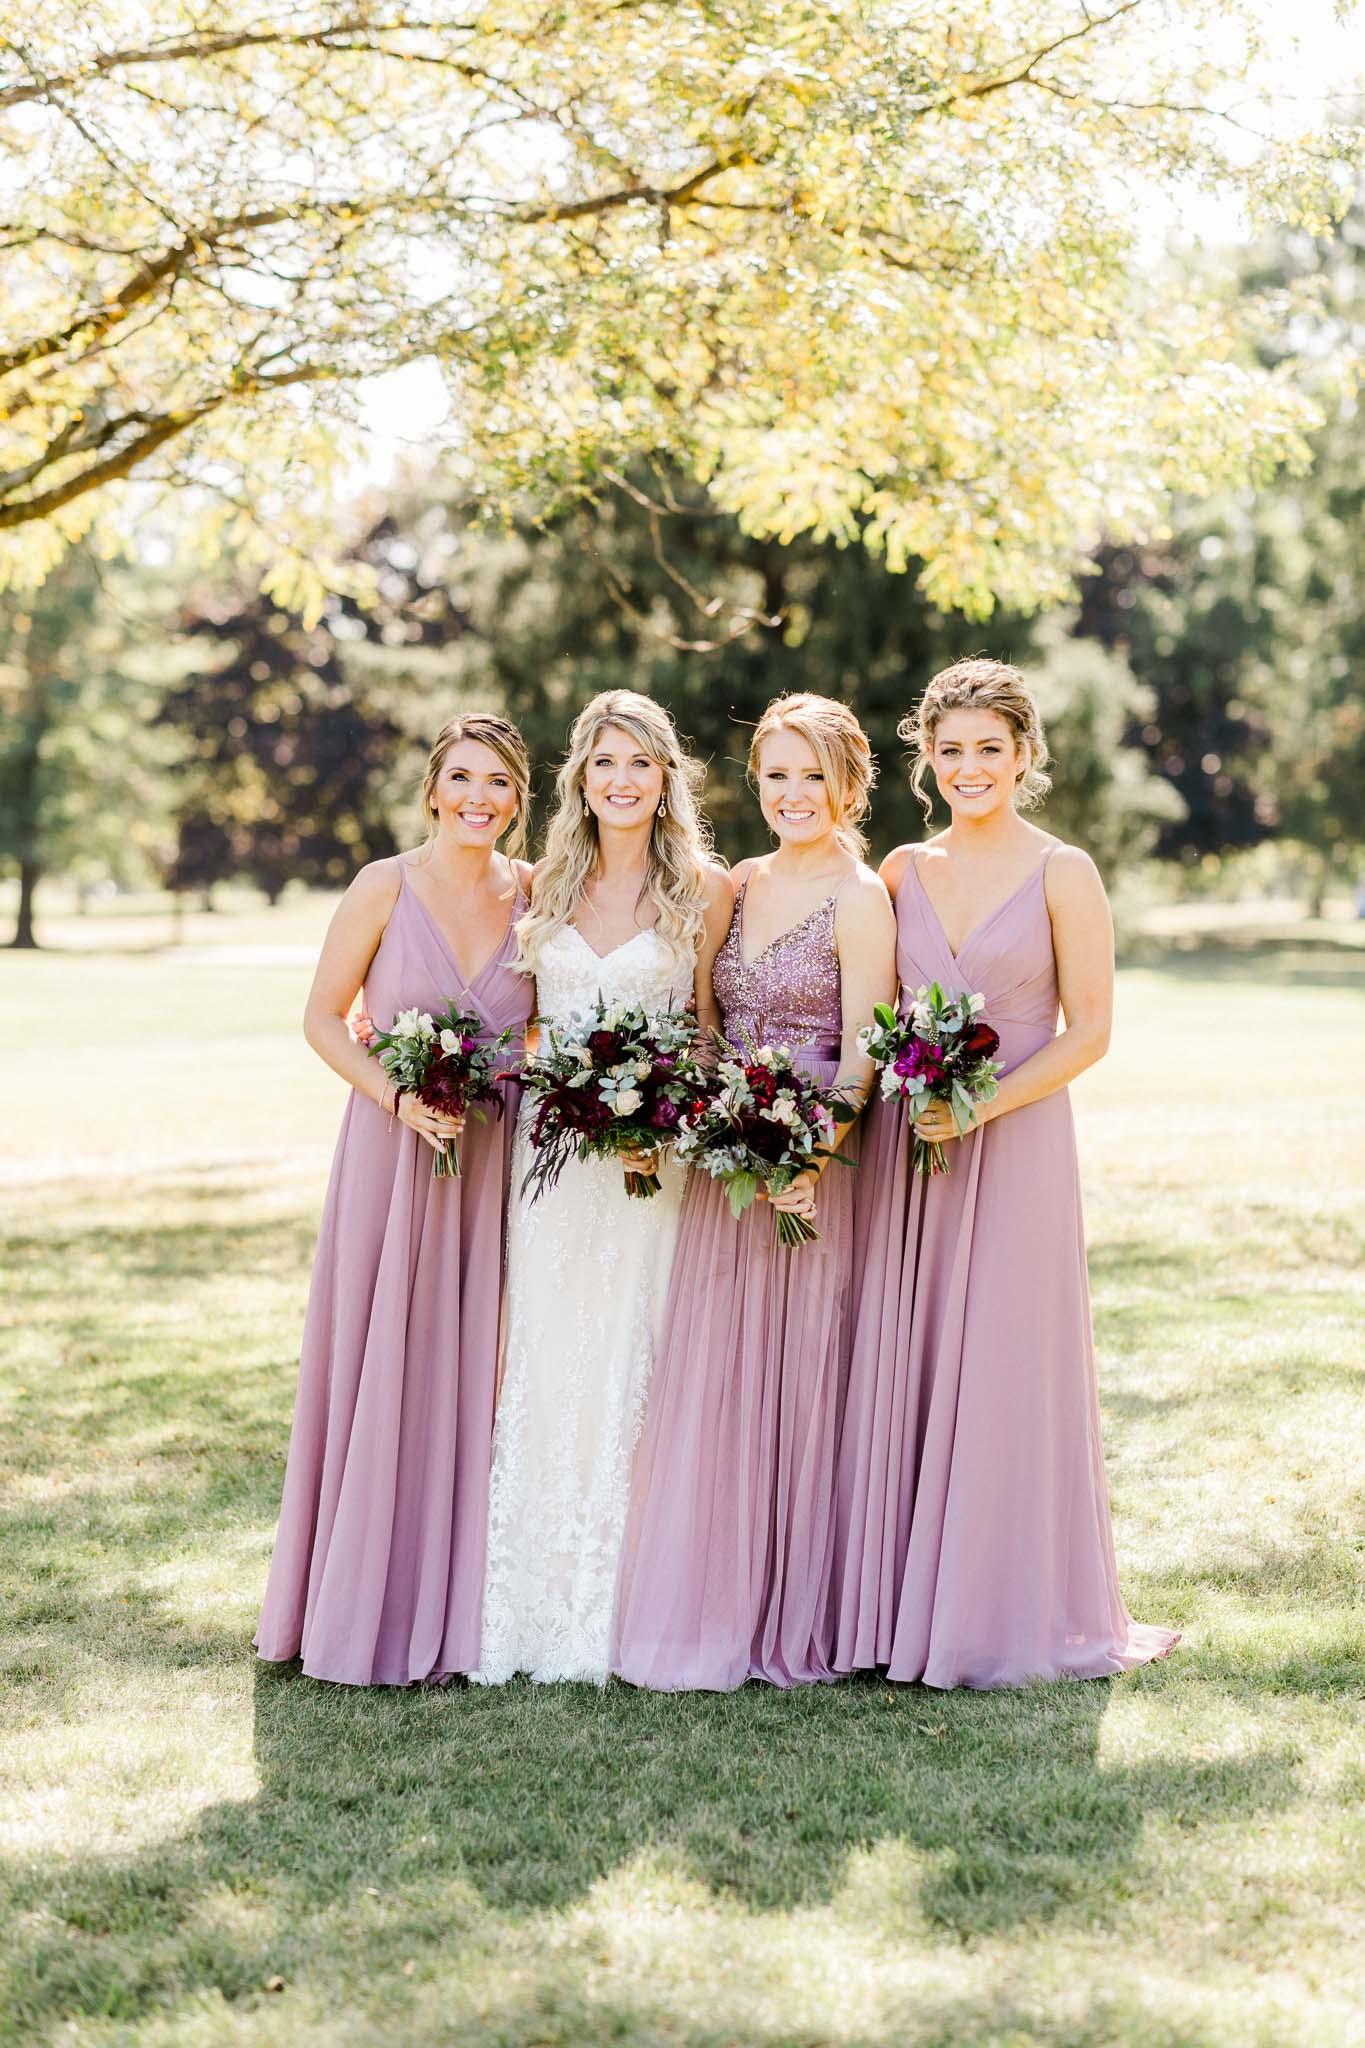 Frosty-Valley-September-Wedding-7426.jpg